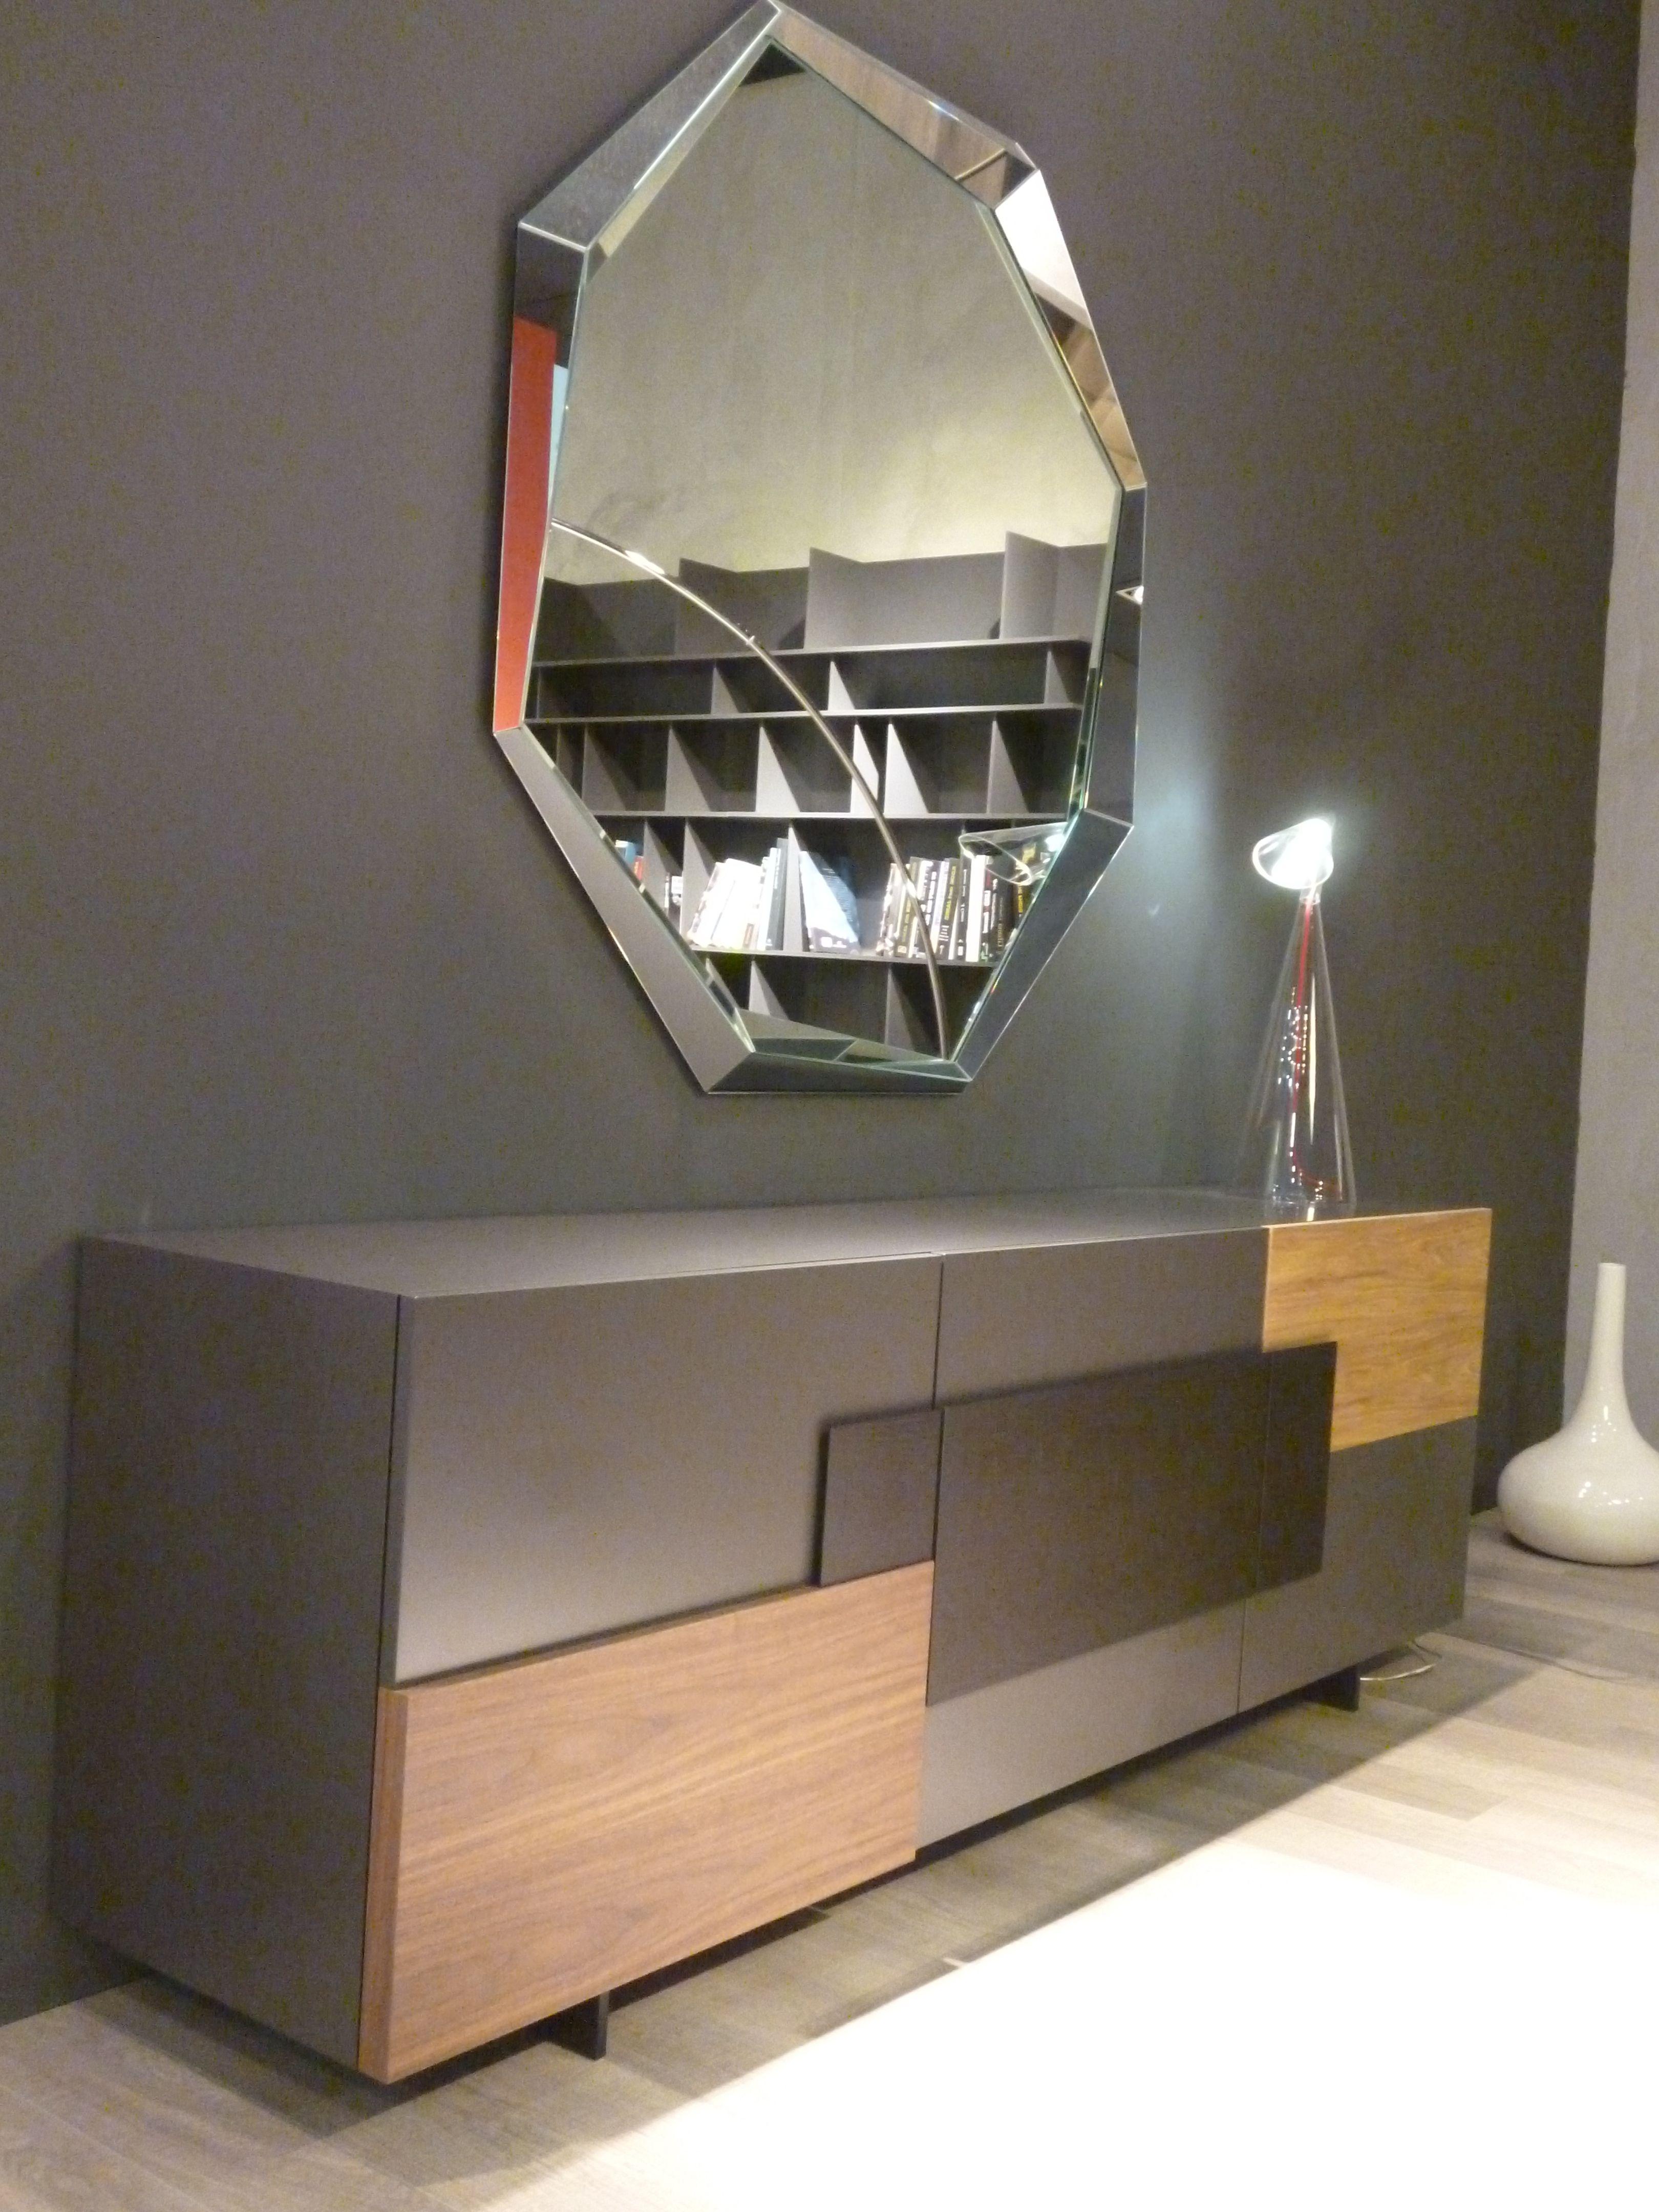 Moa casa madia torino e specchio emerald arredamento for Casa design torino